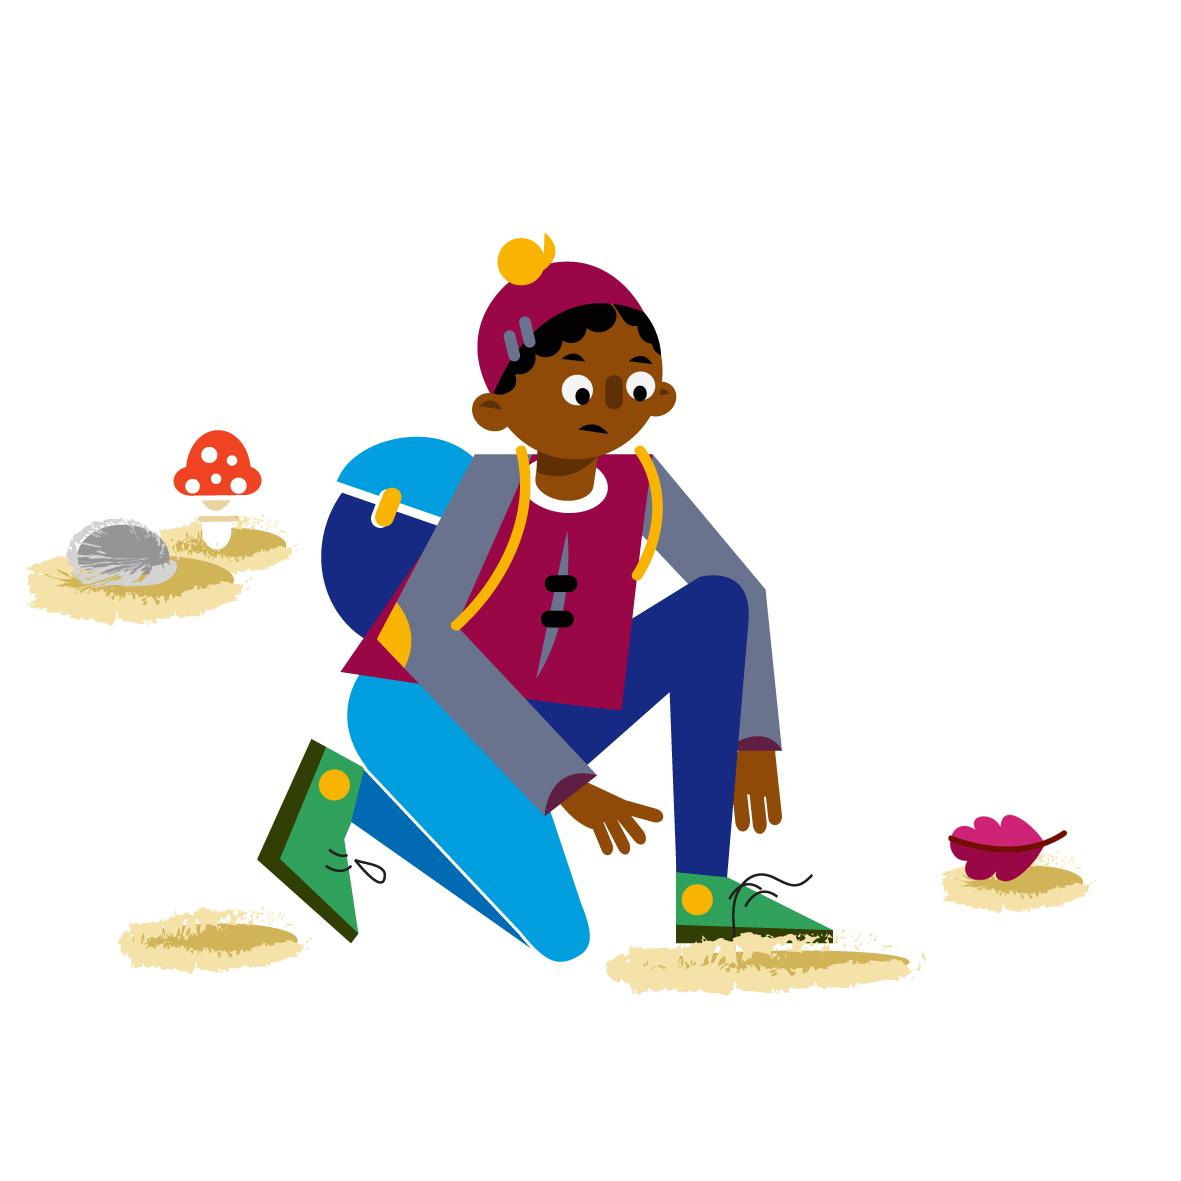 Boy Character design - Vector Illustration © Emeline Barrea, All rights reserved